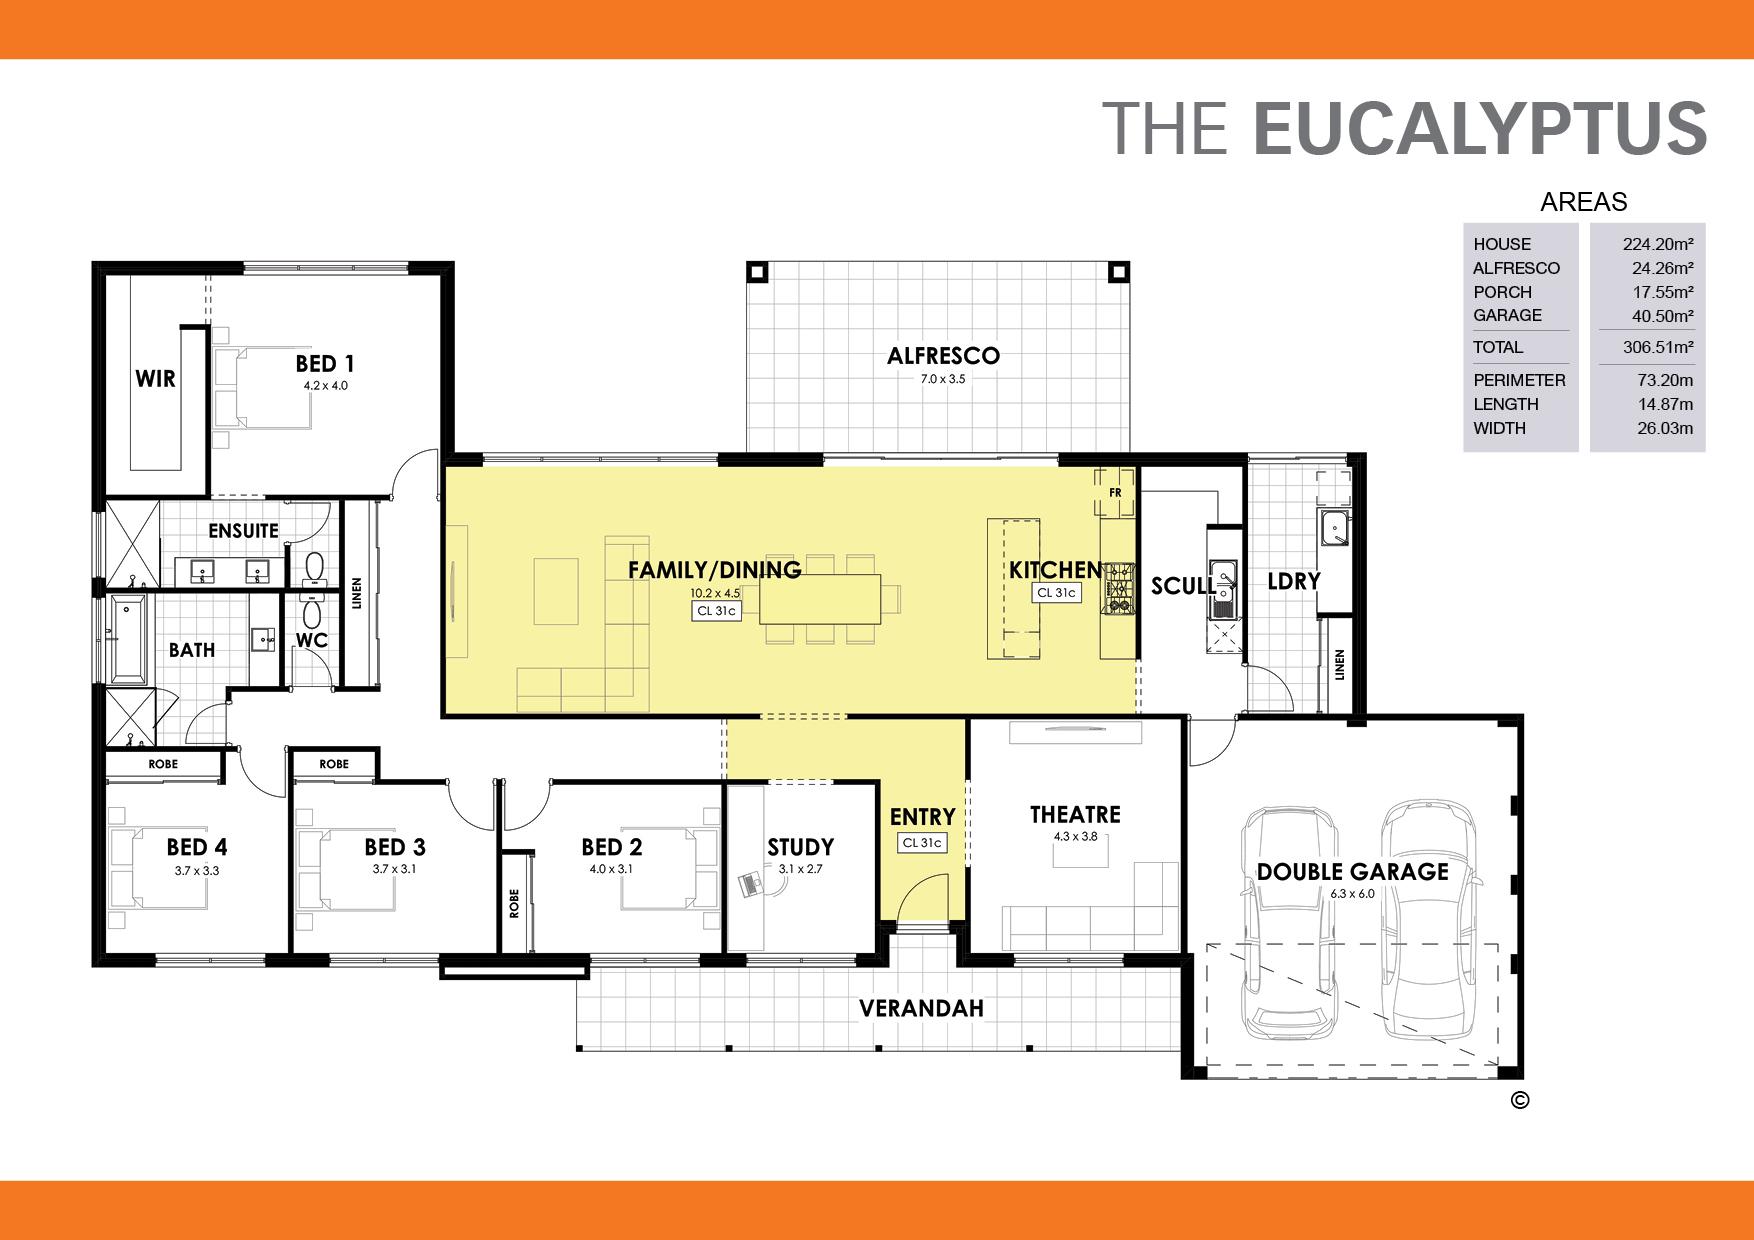 The Eucalyptus Floorplan